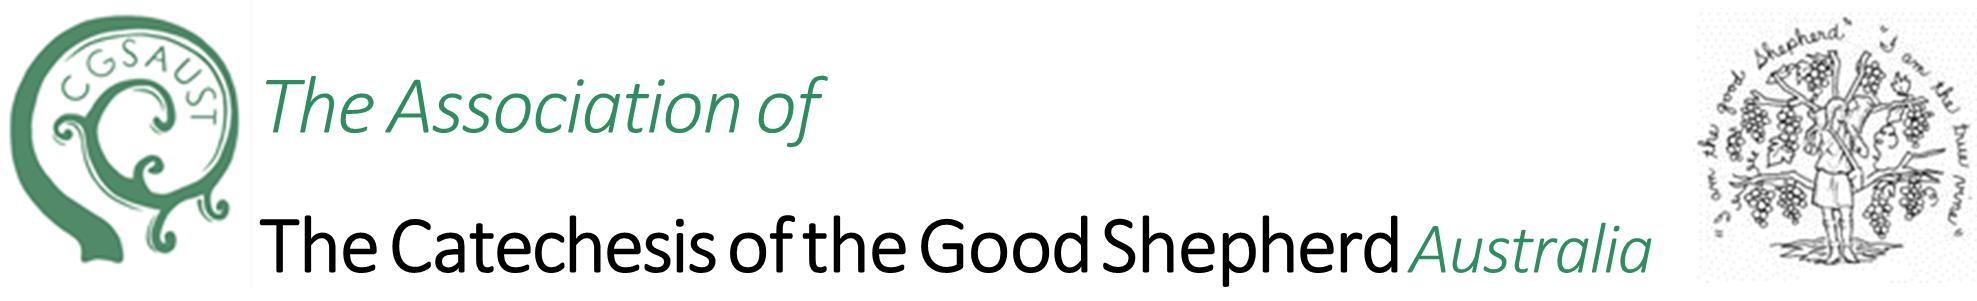 The Catechesis of the Good Shepherd Australia